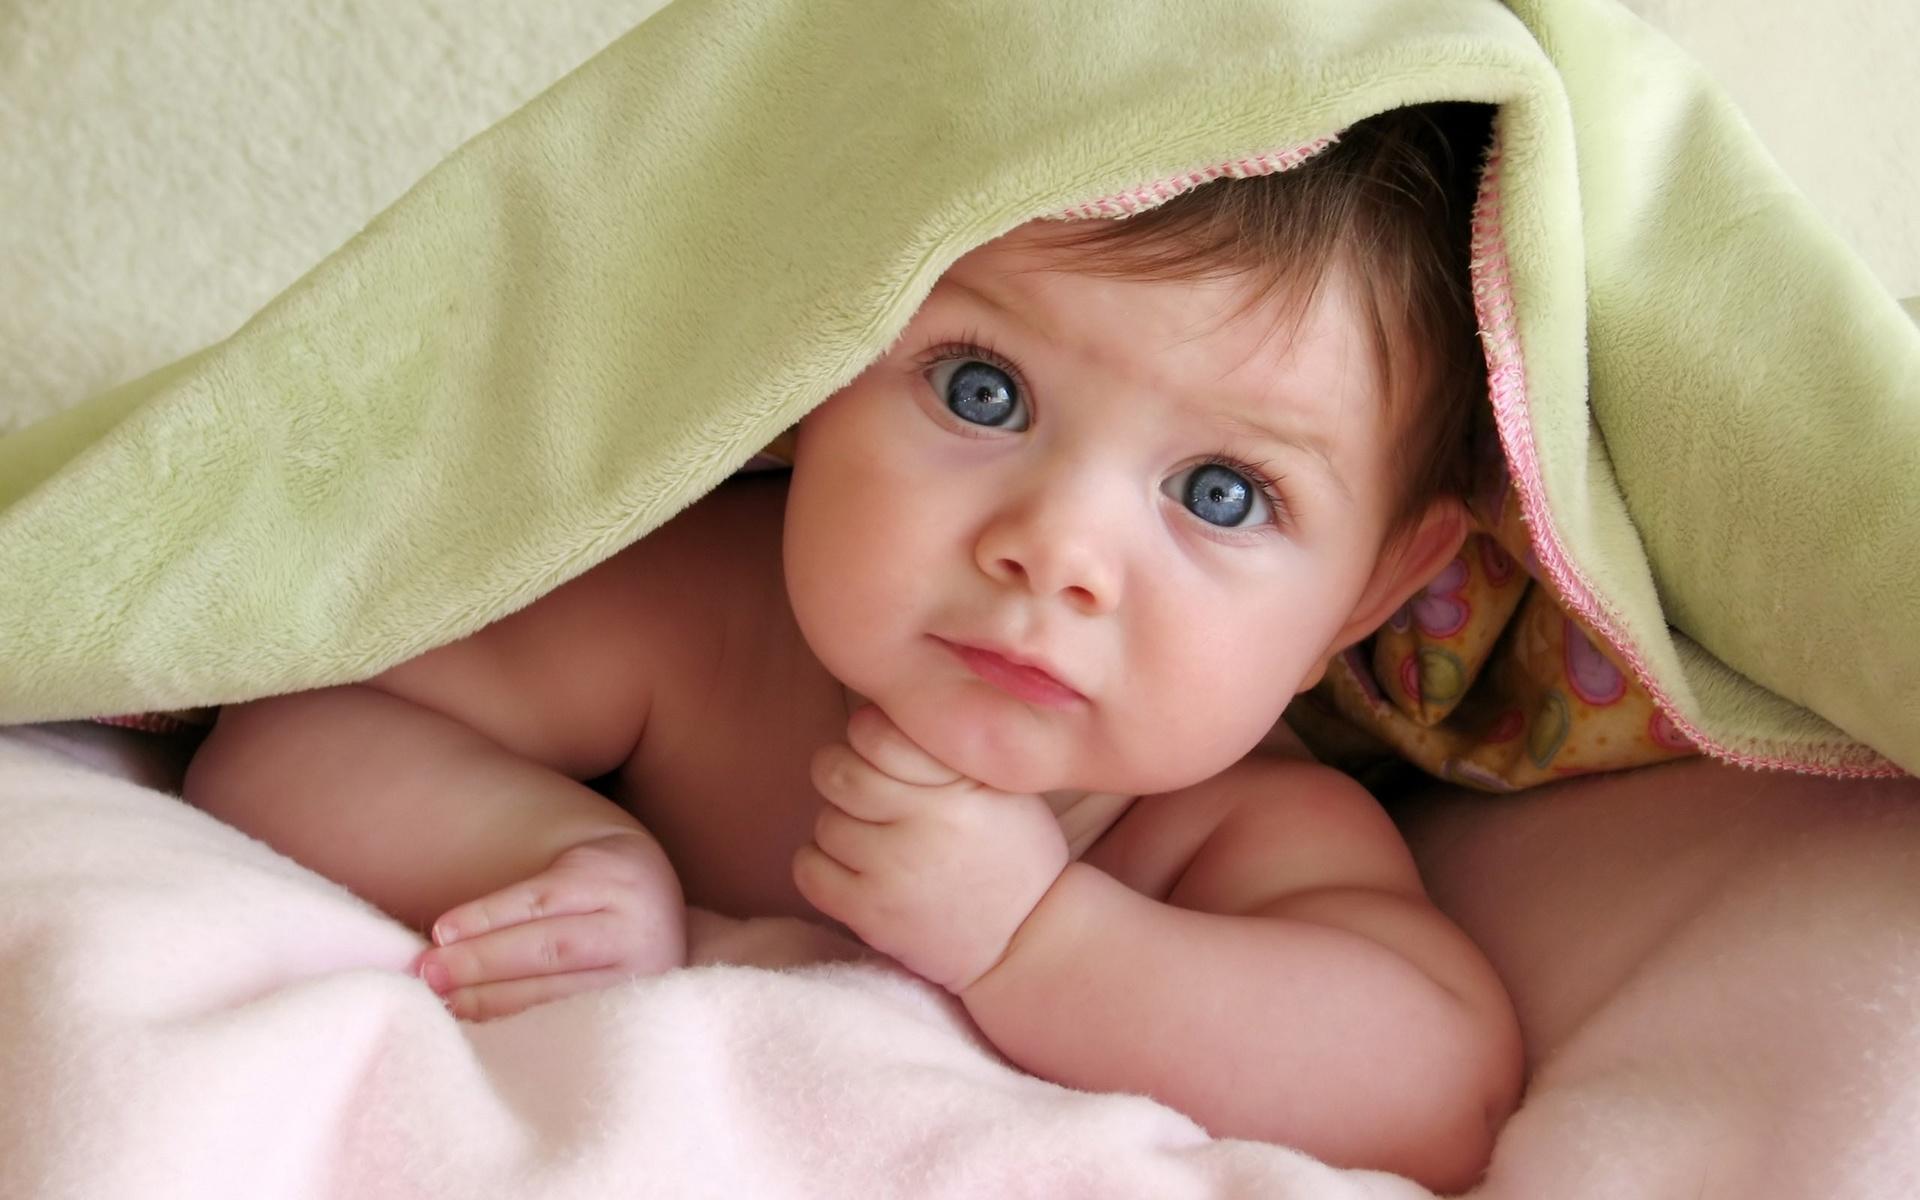 Картинки или фото маленьких деток